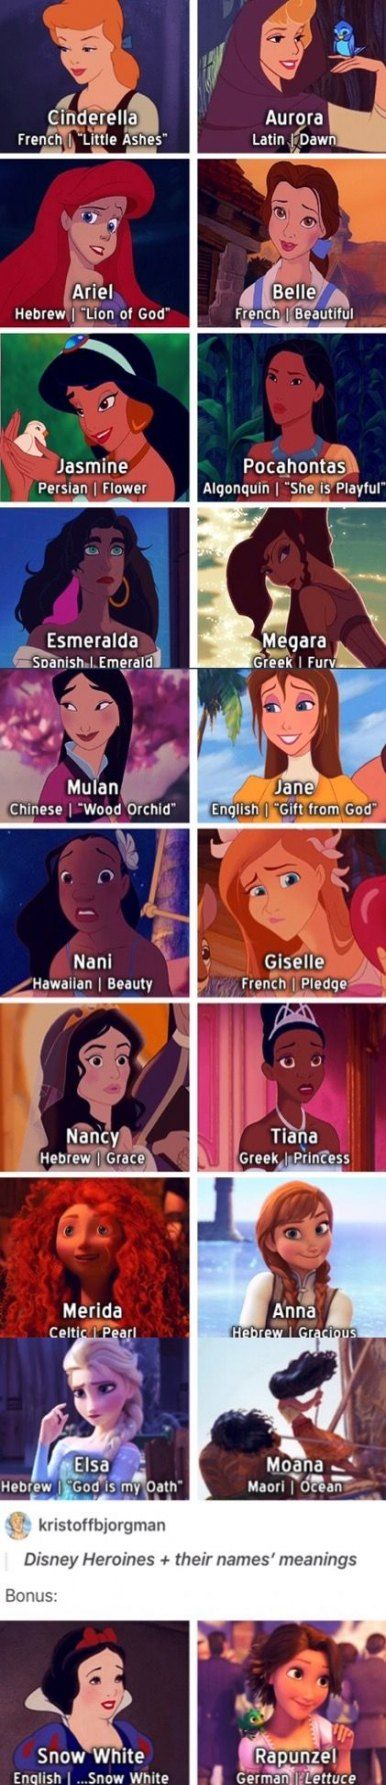 Funny Disney Princess Interesting Facts 55 Best Ideas